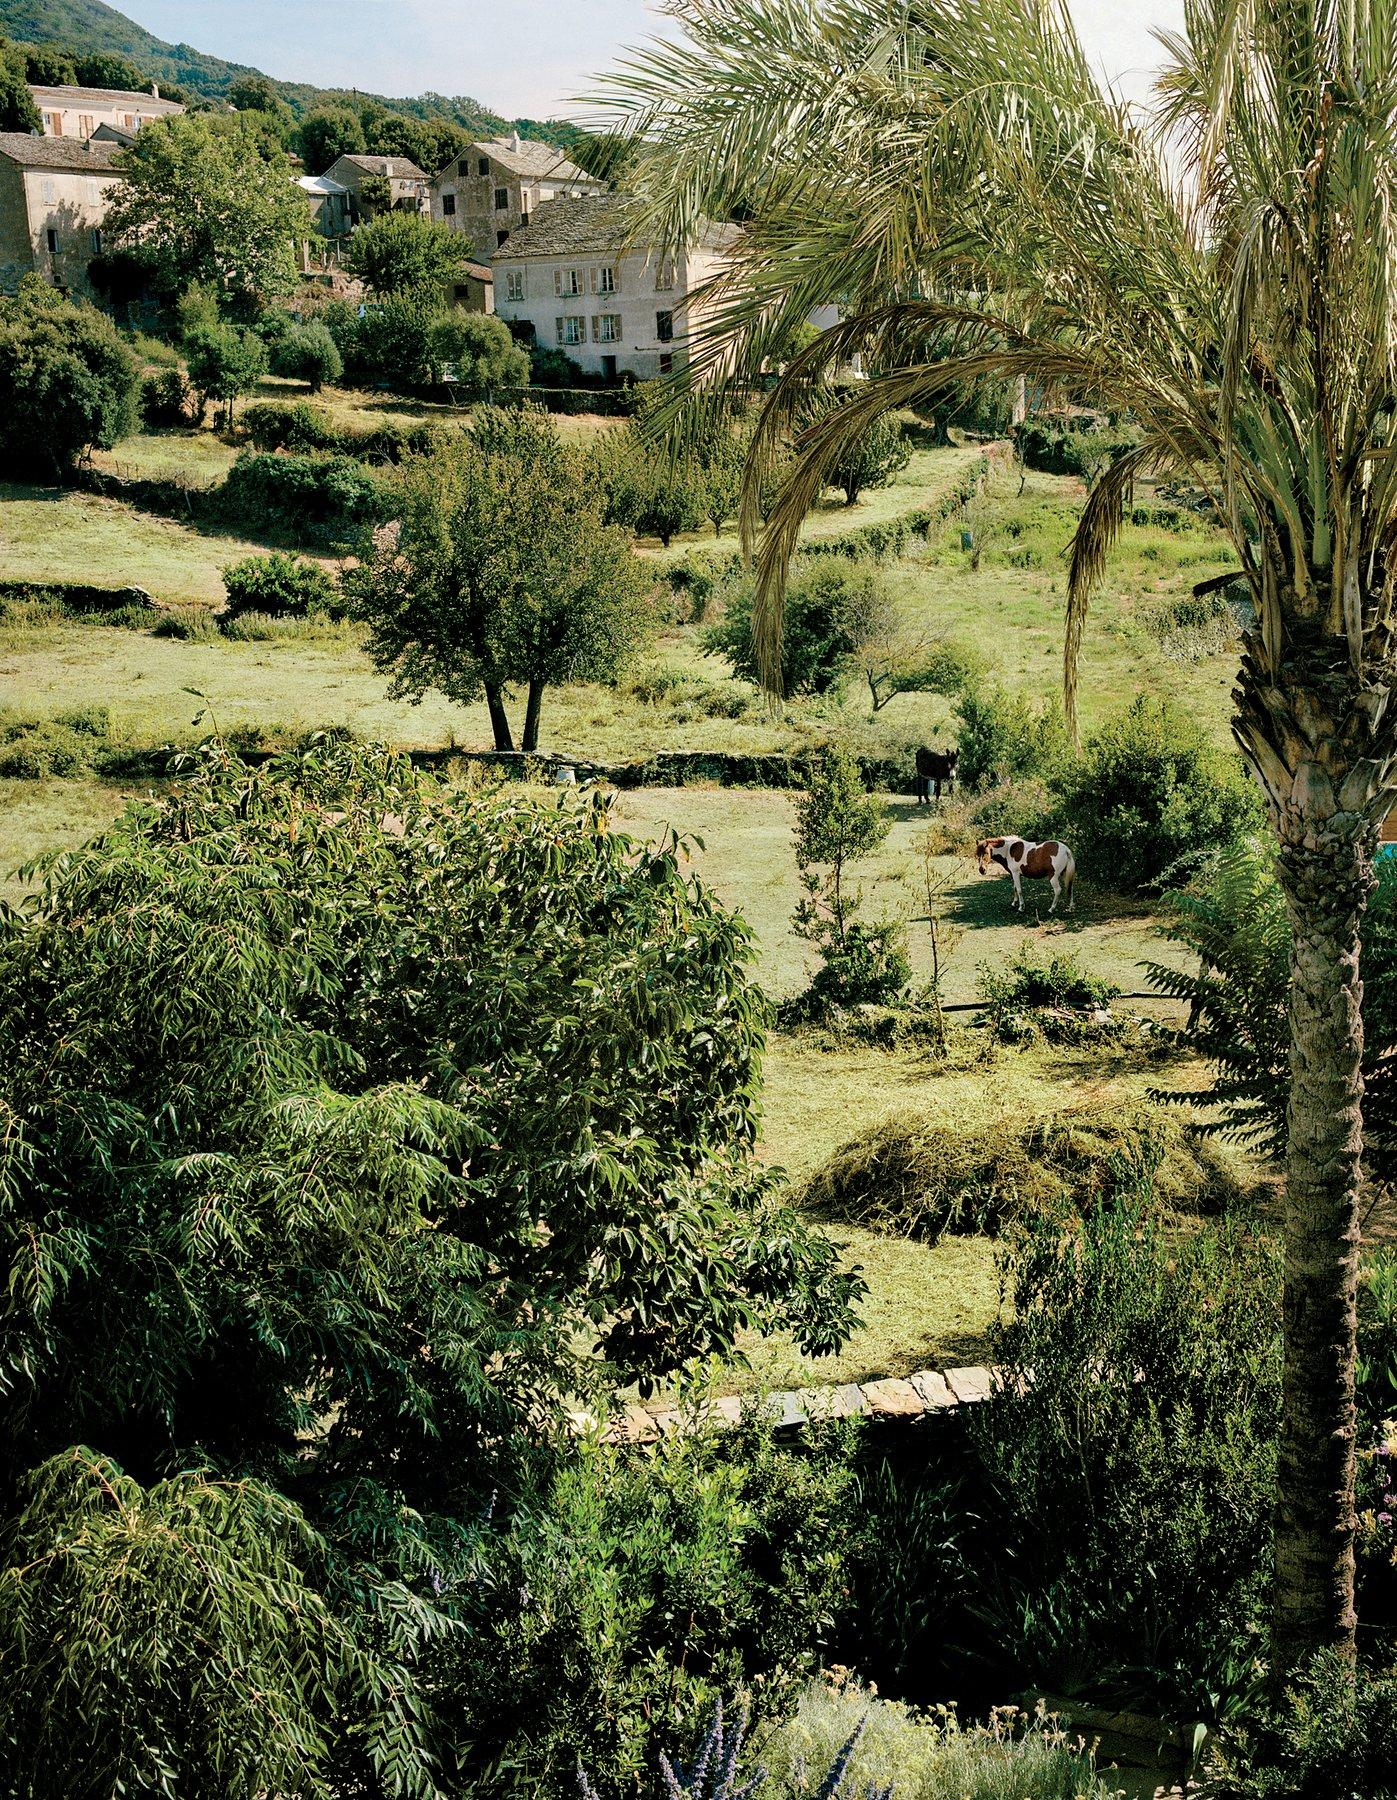 ROSE & IVY Journal A Corsica Retreat